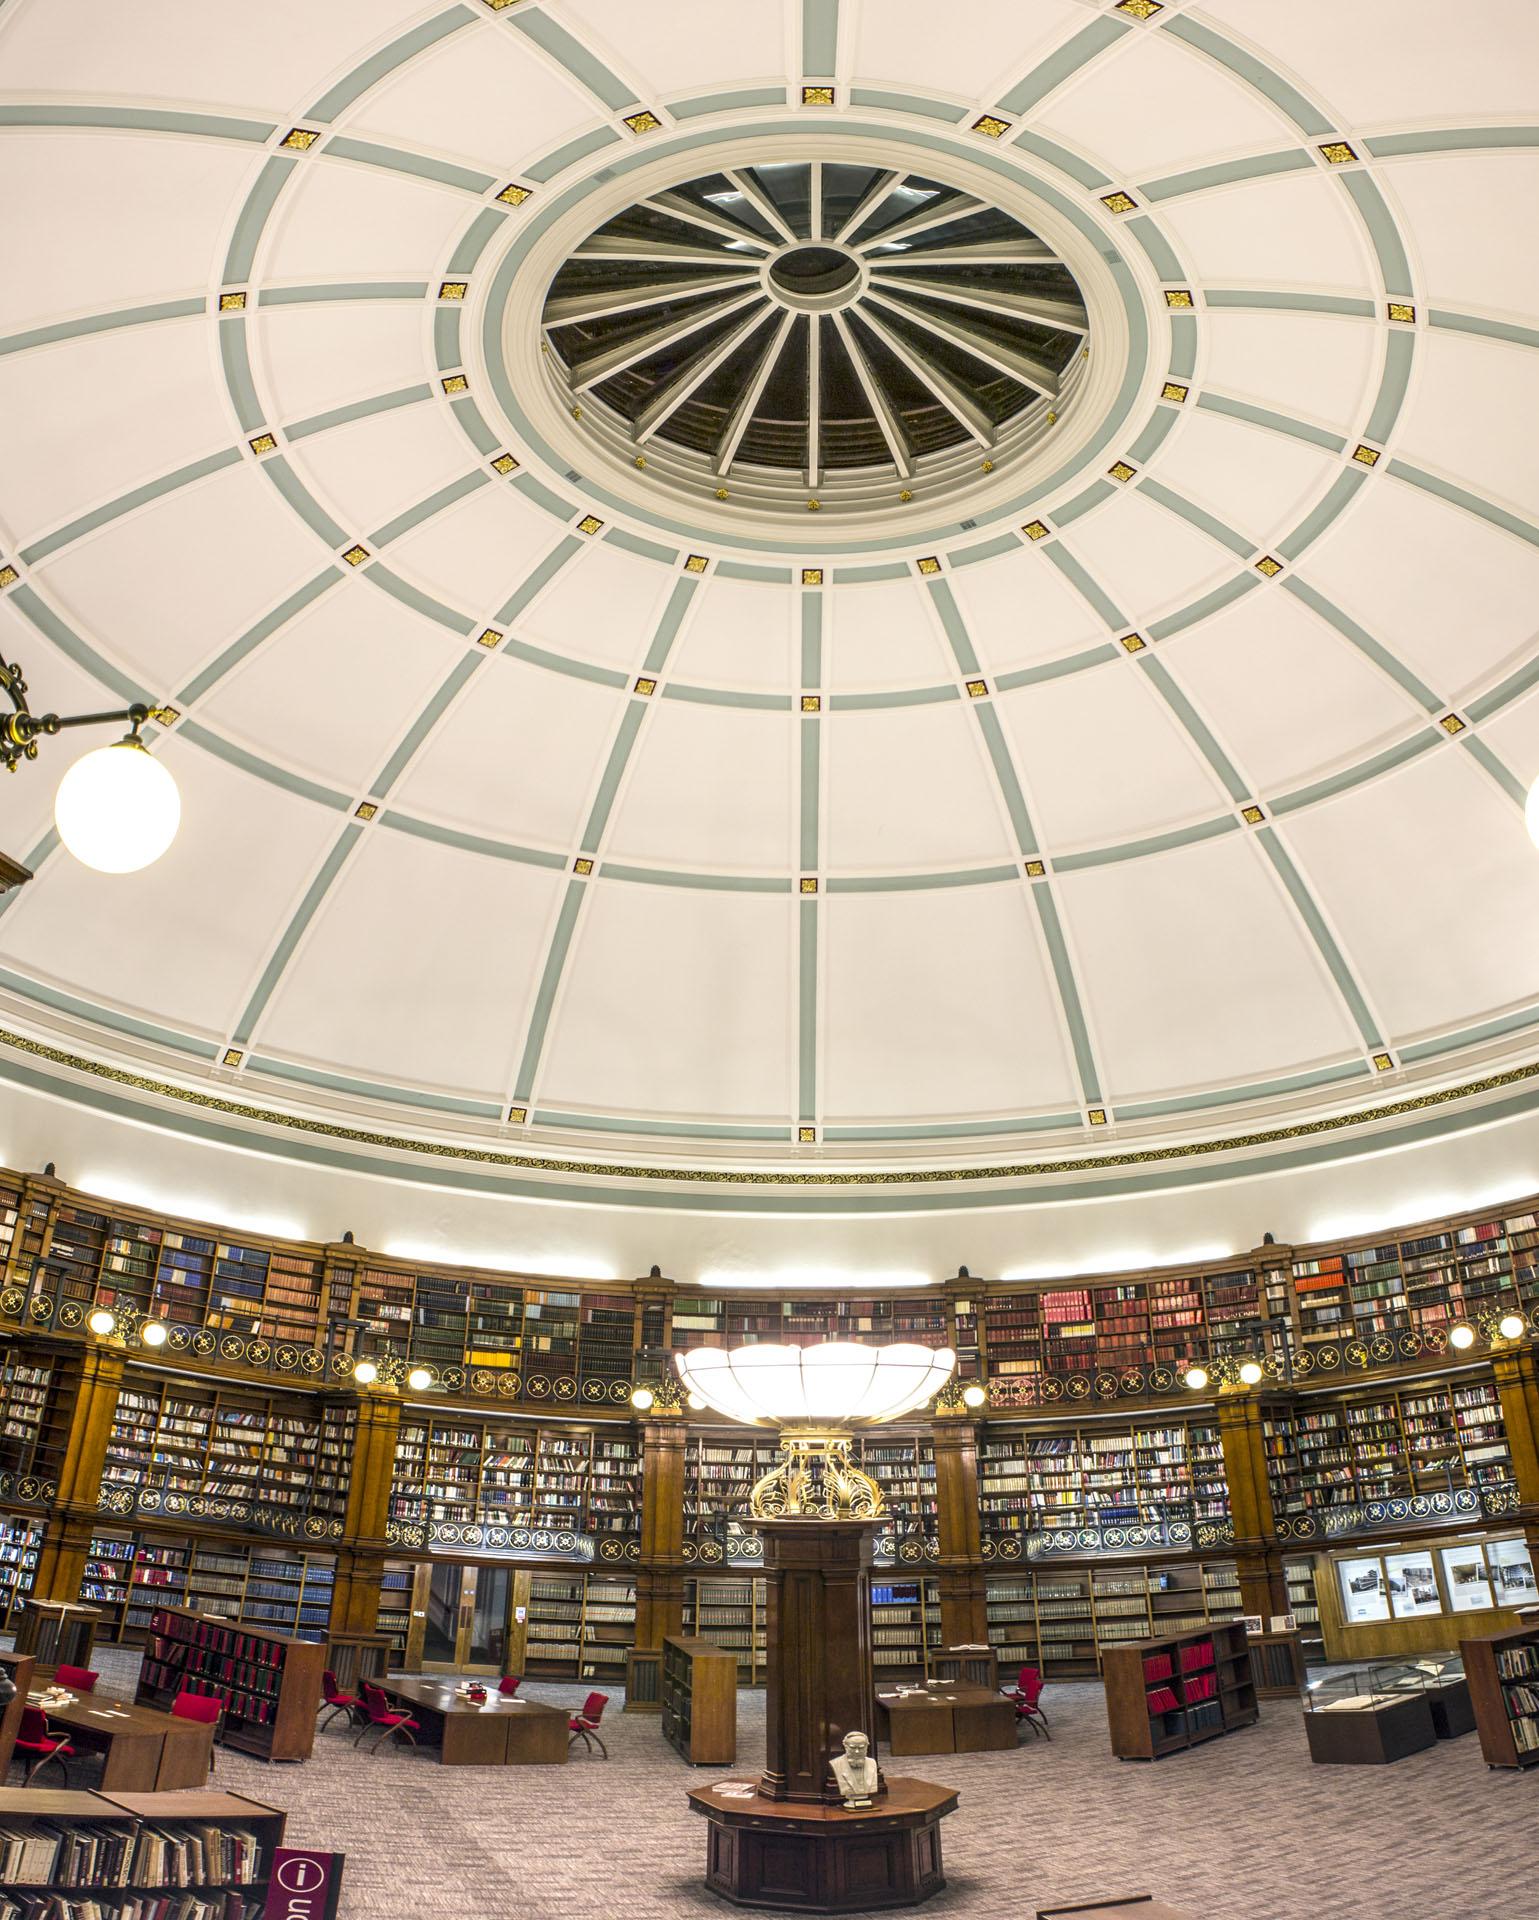 Liverpool Central Library Archive building architecture design interior view